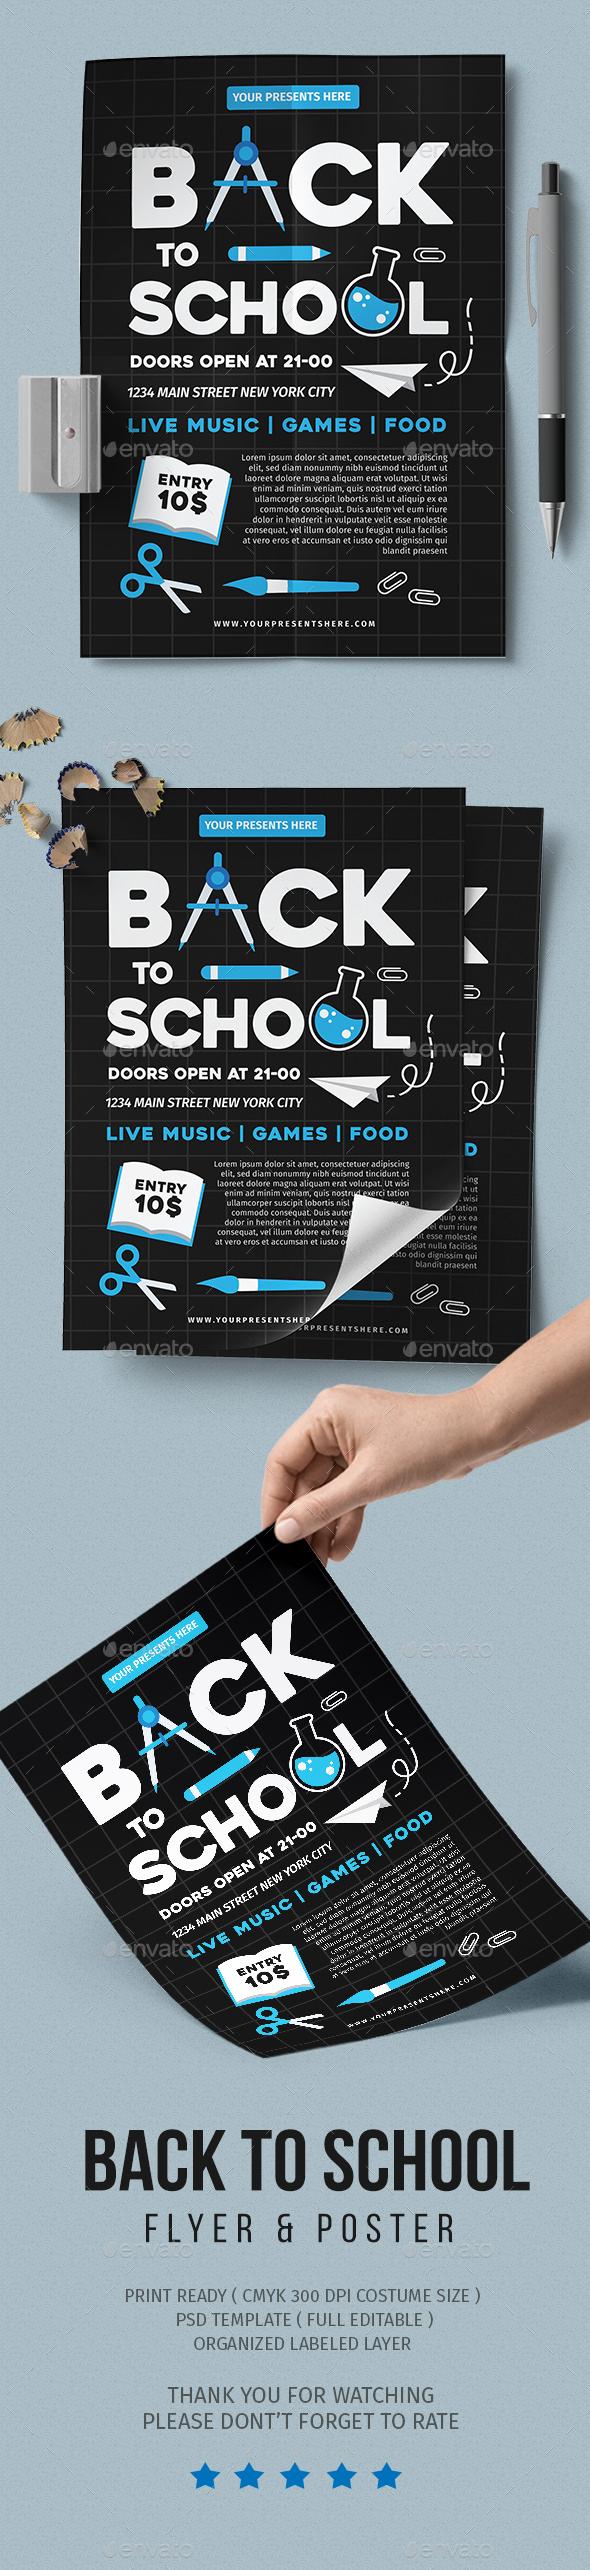 GraphicRiver Back To School Vol 3 20394886